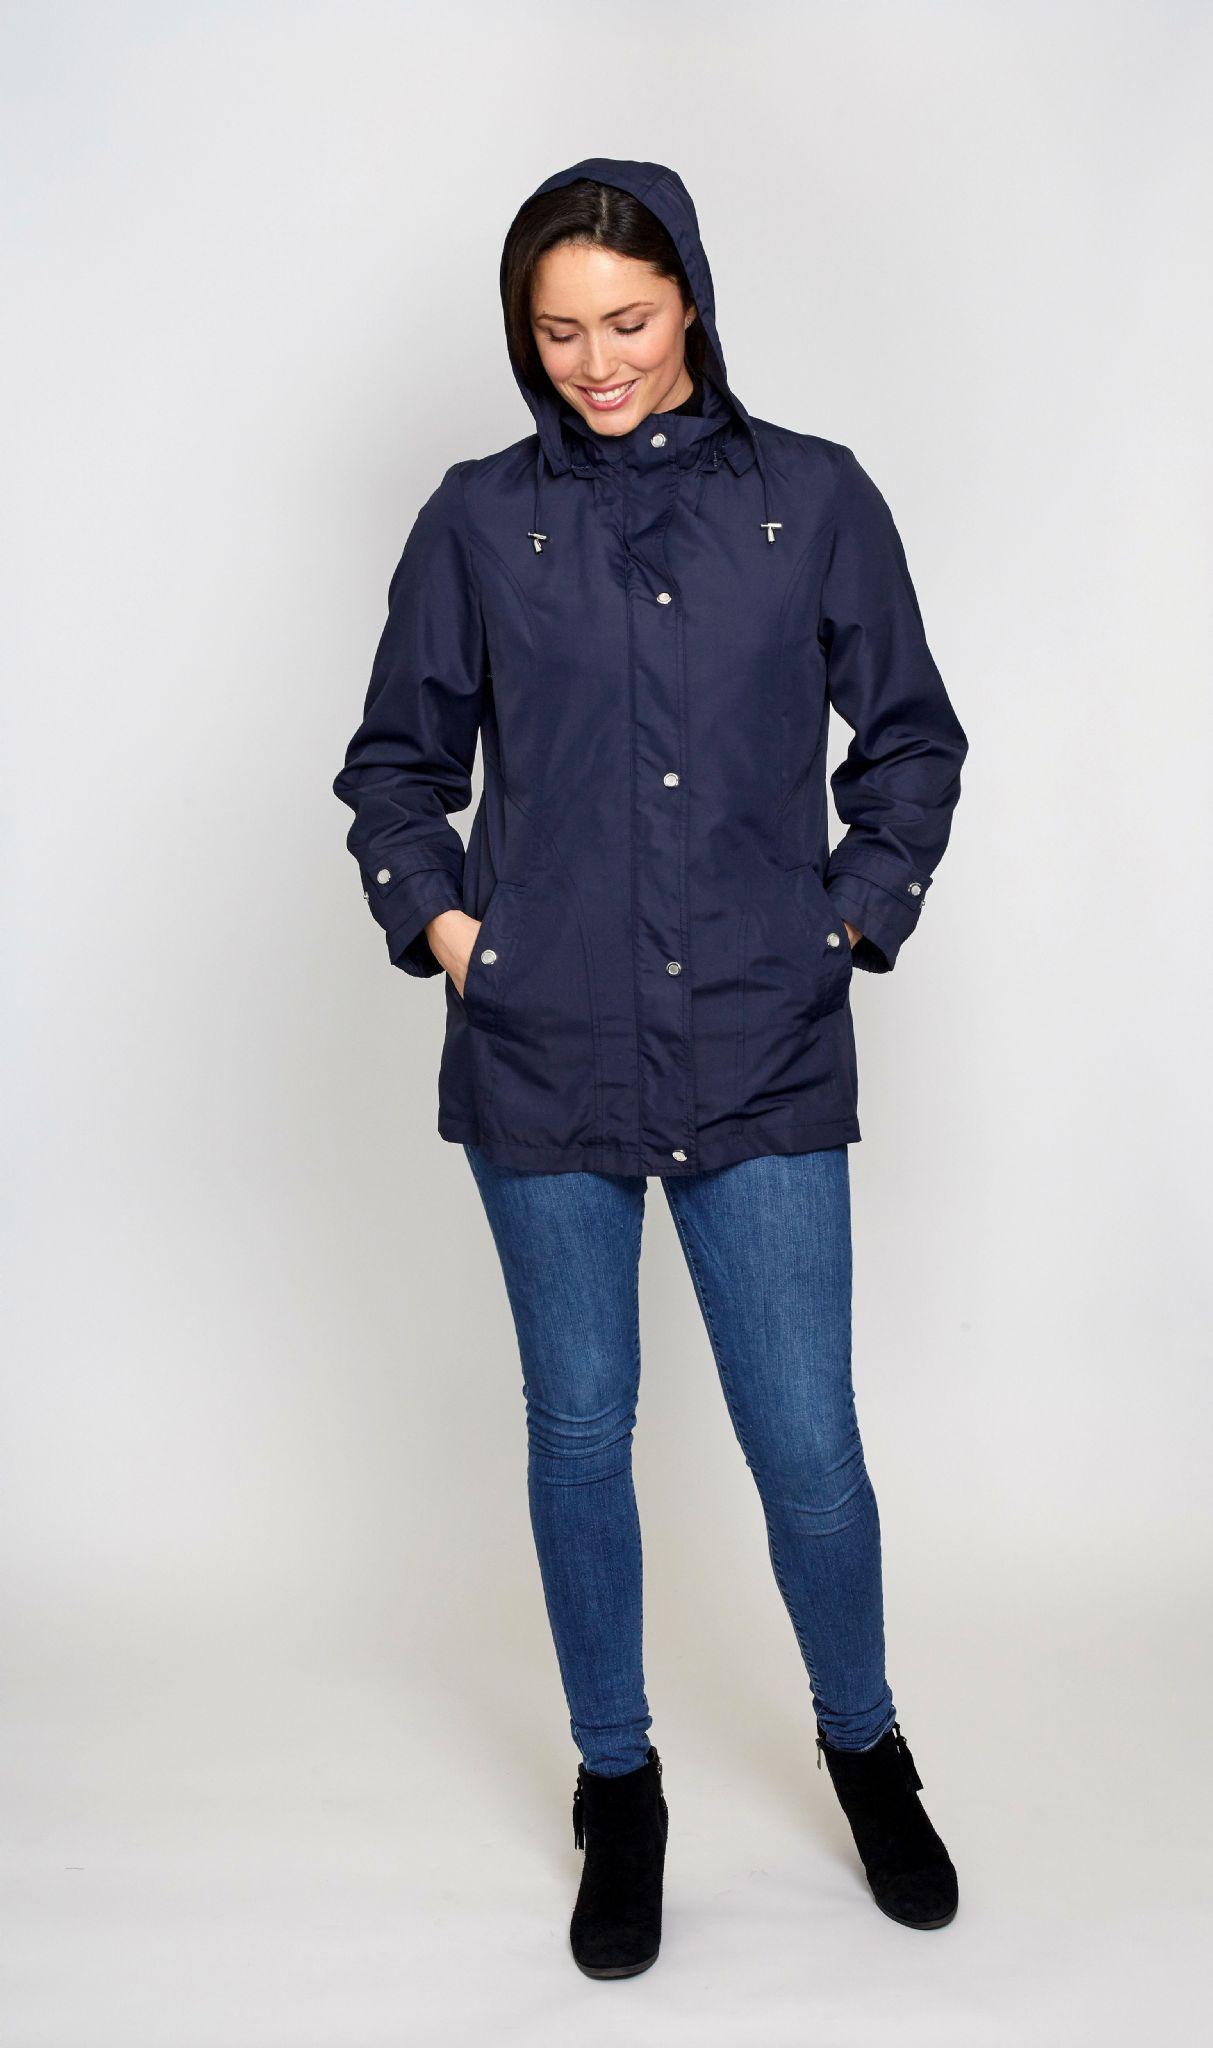 Womens rain jackets with hood